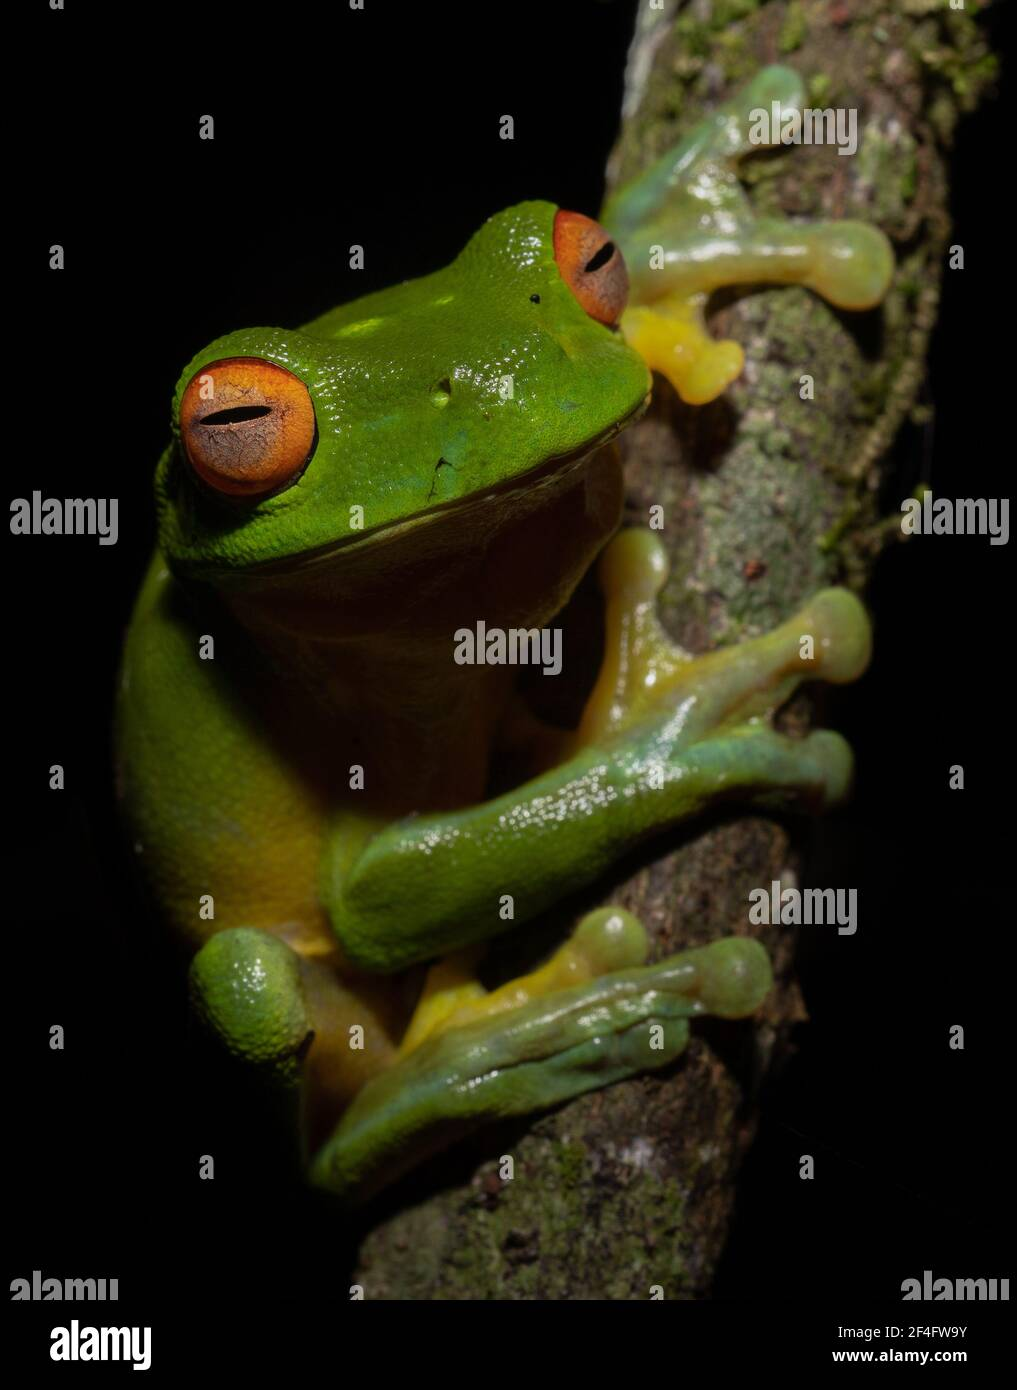 Red Eyed Tree Frog on a branch, Natural Bridge, Queensland, Australien Stockfoto